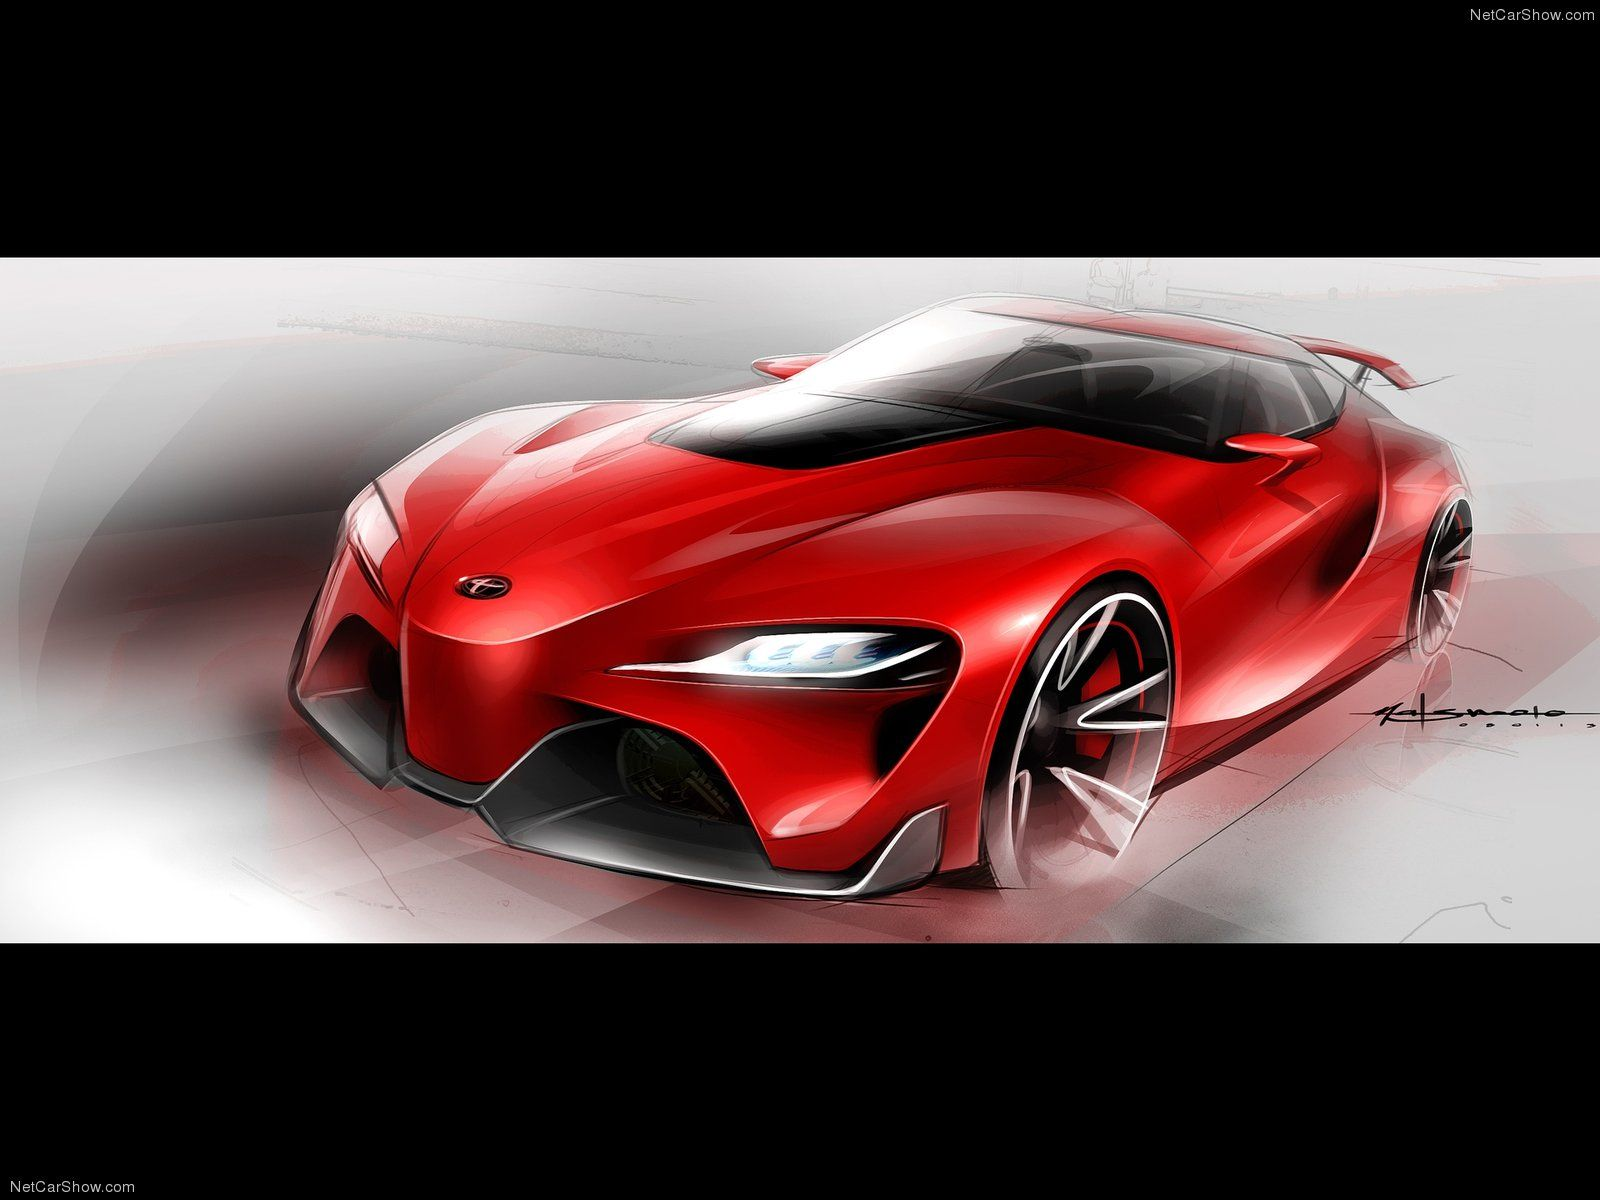 Toyota FT 1 Concept 2014 wallpaper 3a Sketch